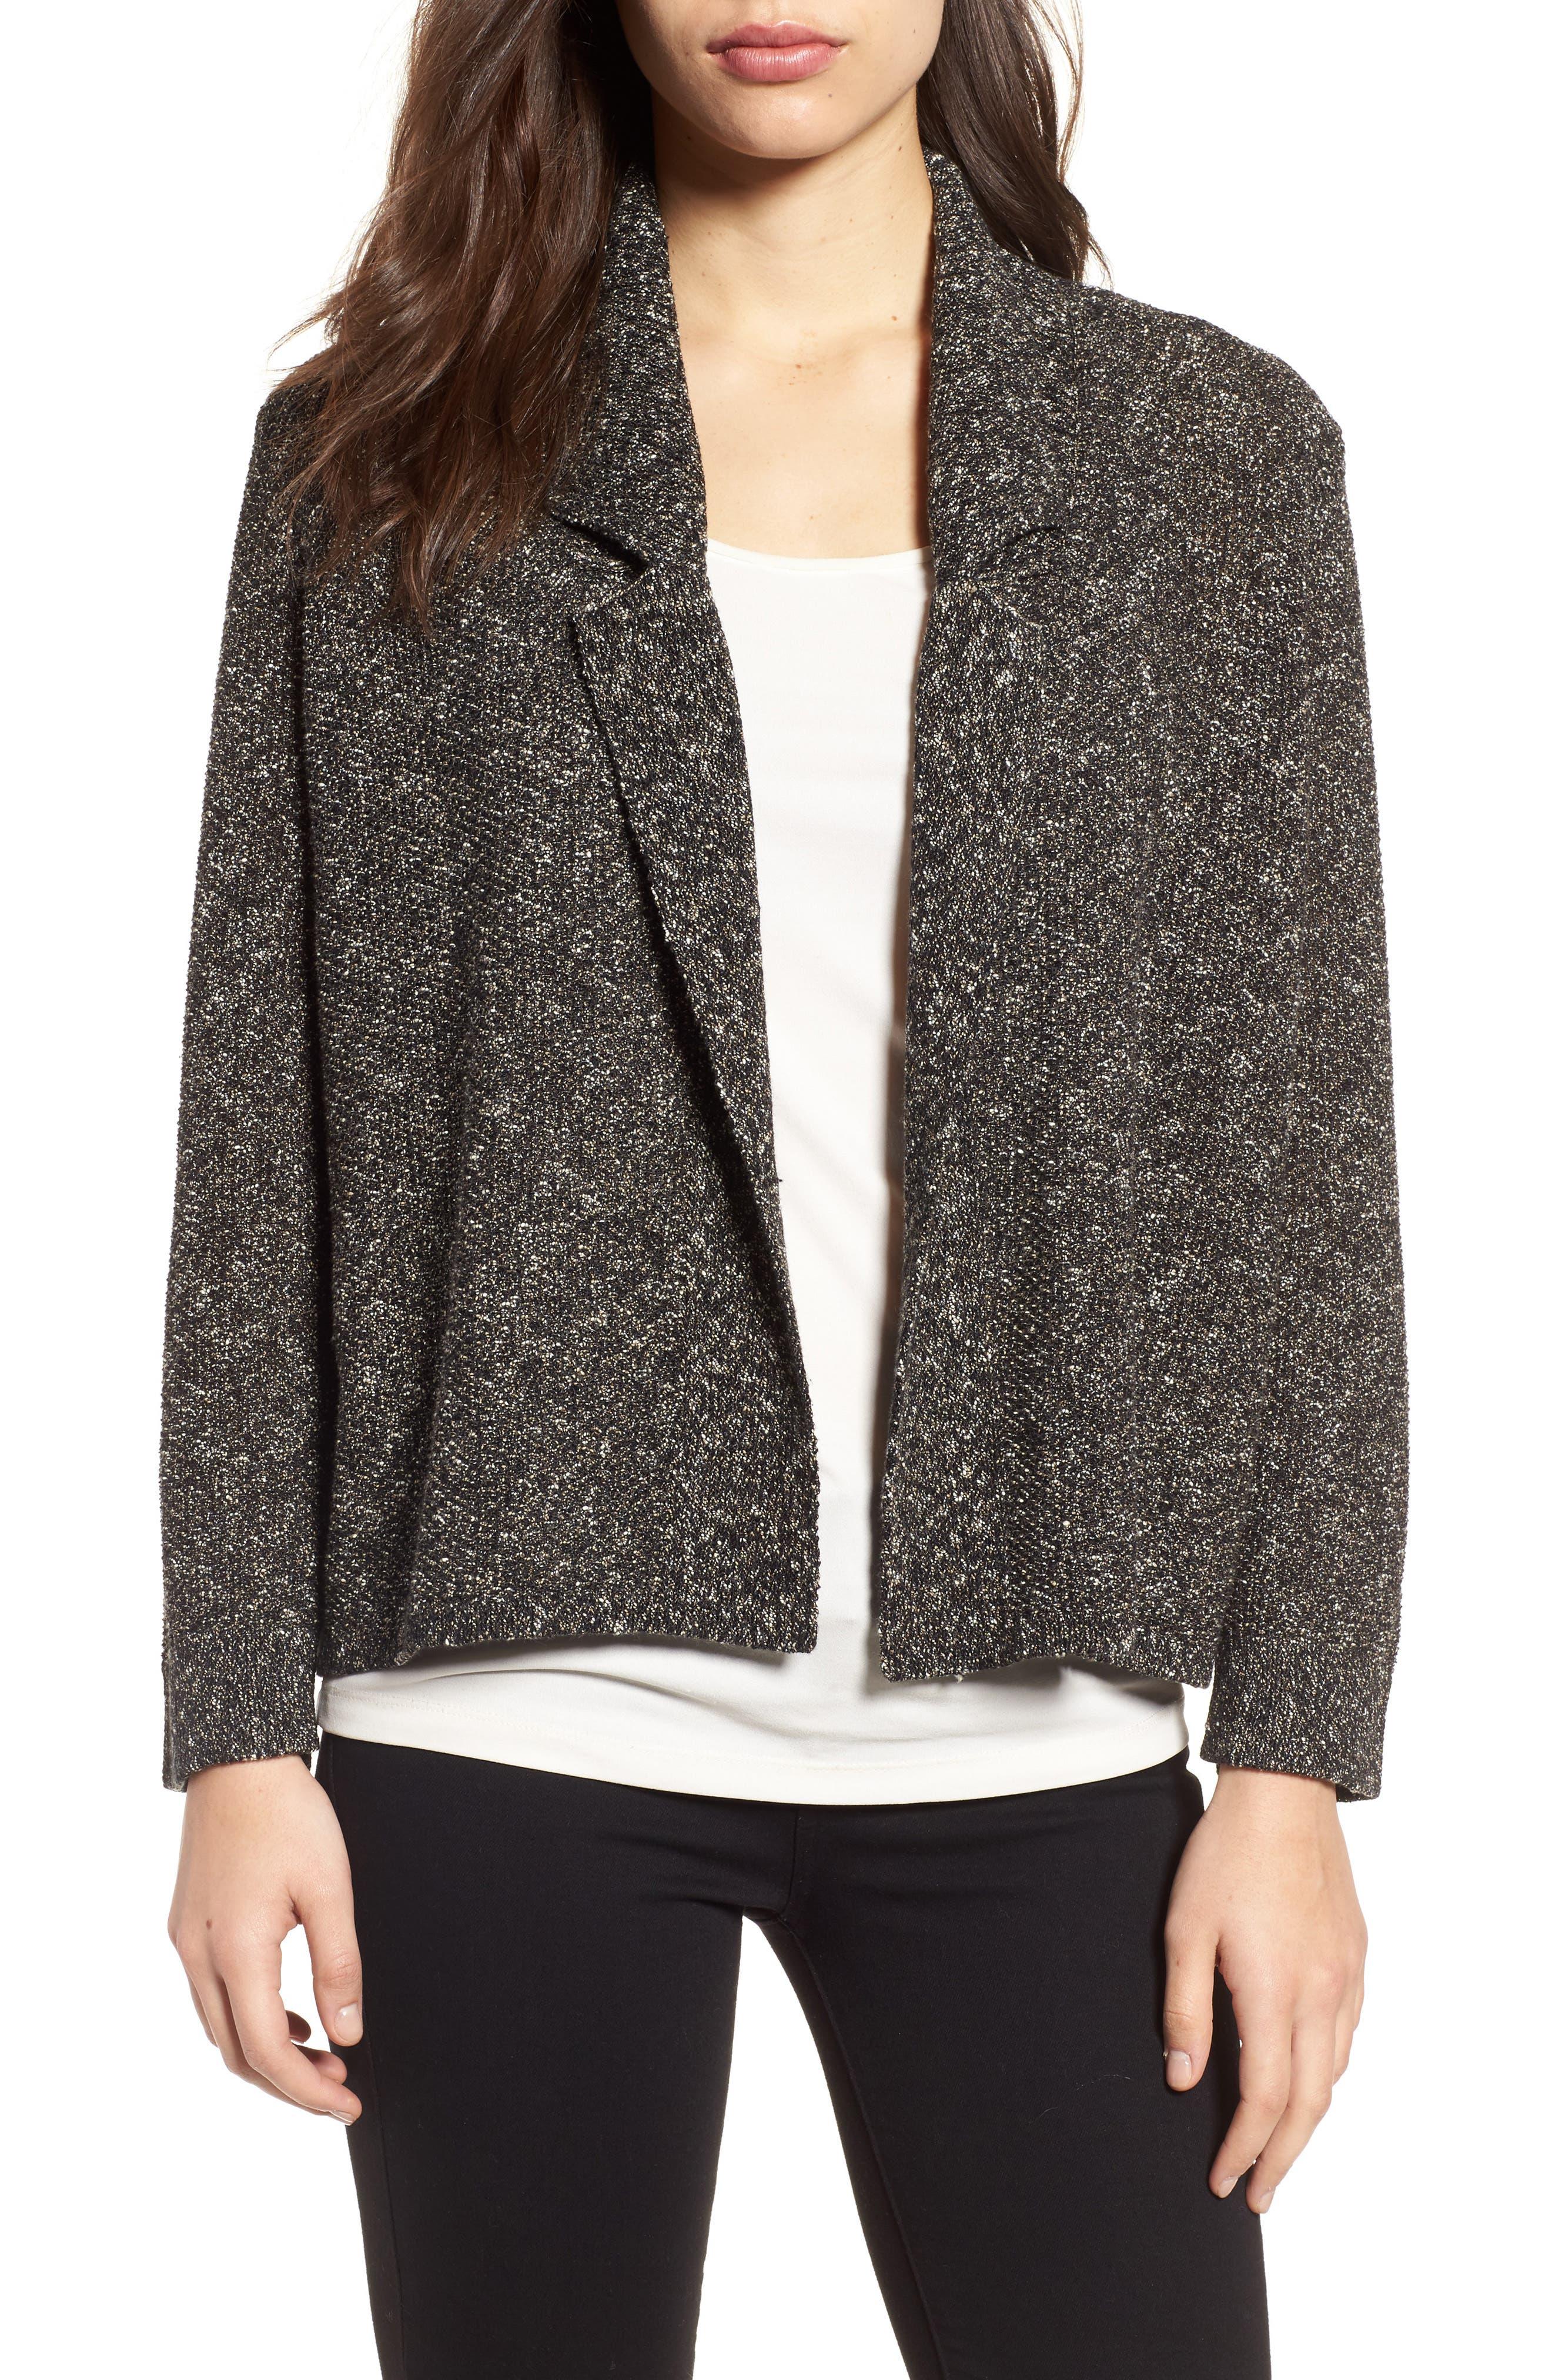 Alternate Image 1 Selected - Eileen Fisher Tweed Sweater Jacket